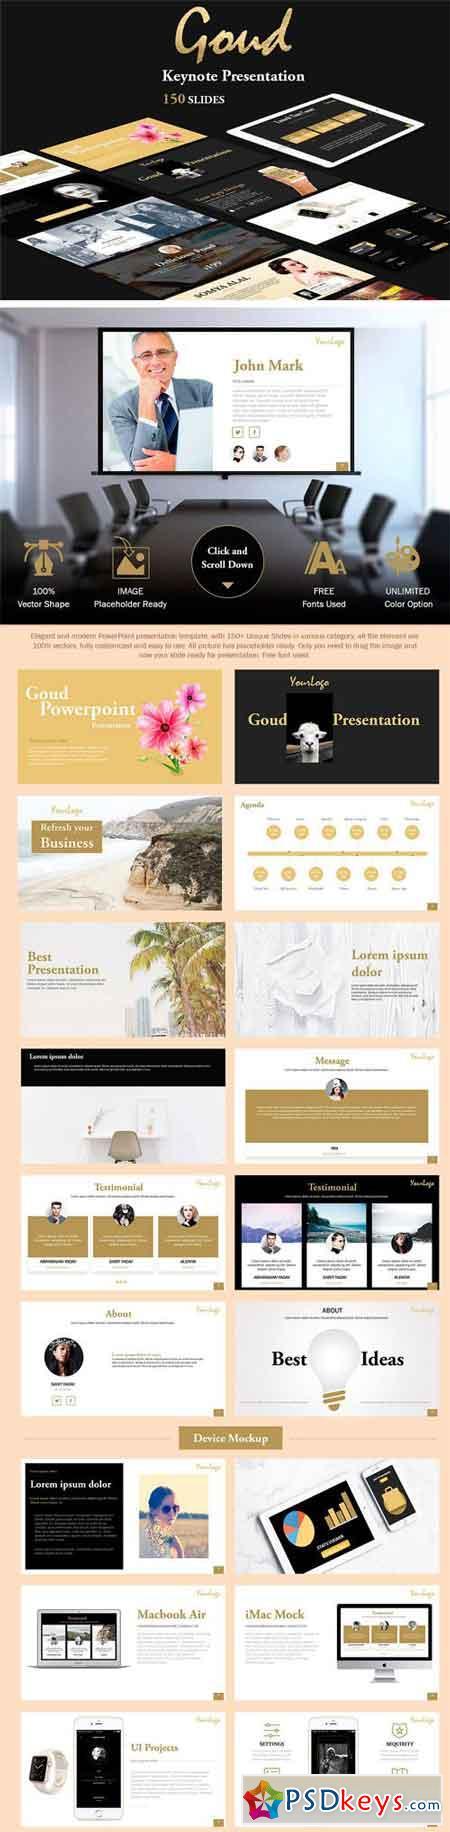 Goud Keynote Presentation 1479446 » Free Download Photoshop